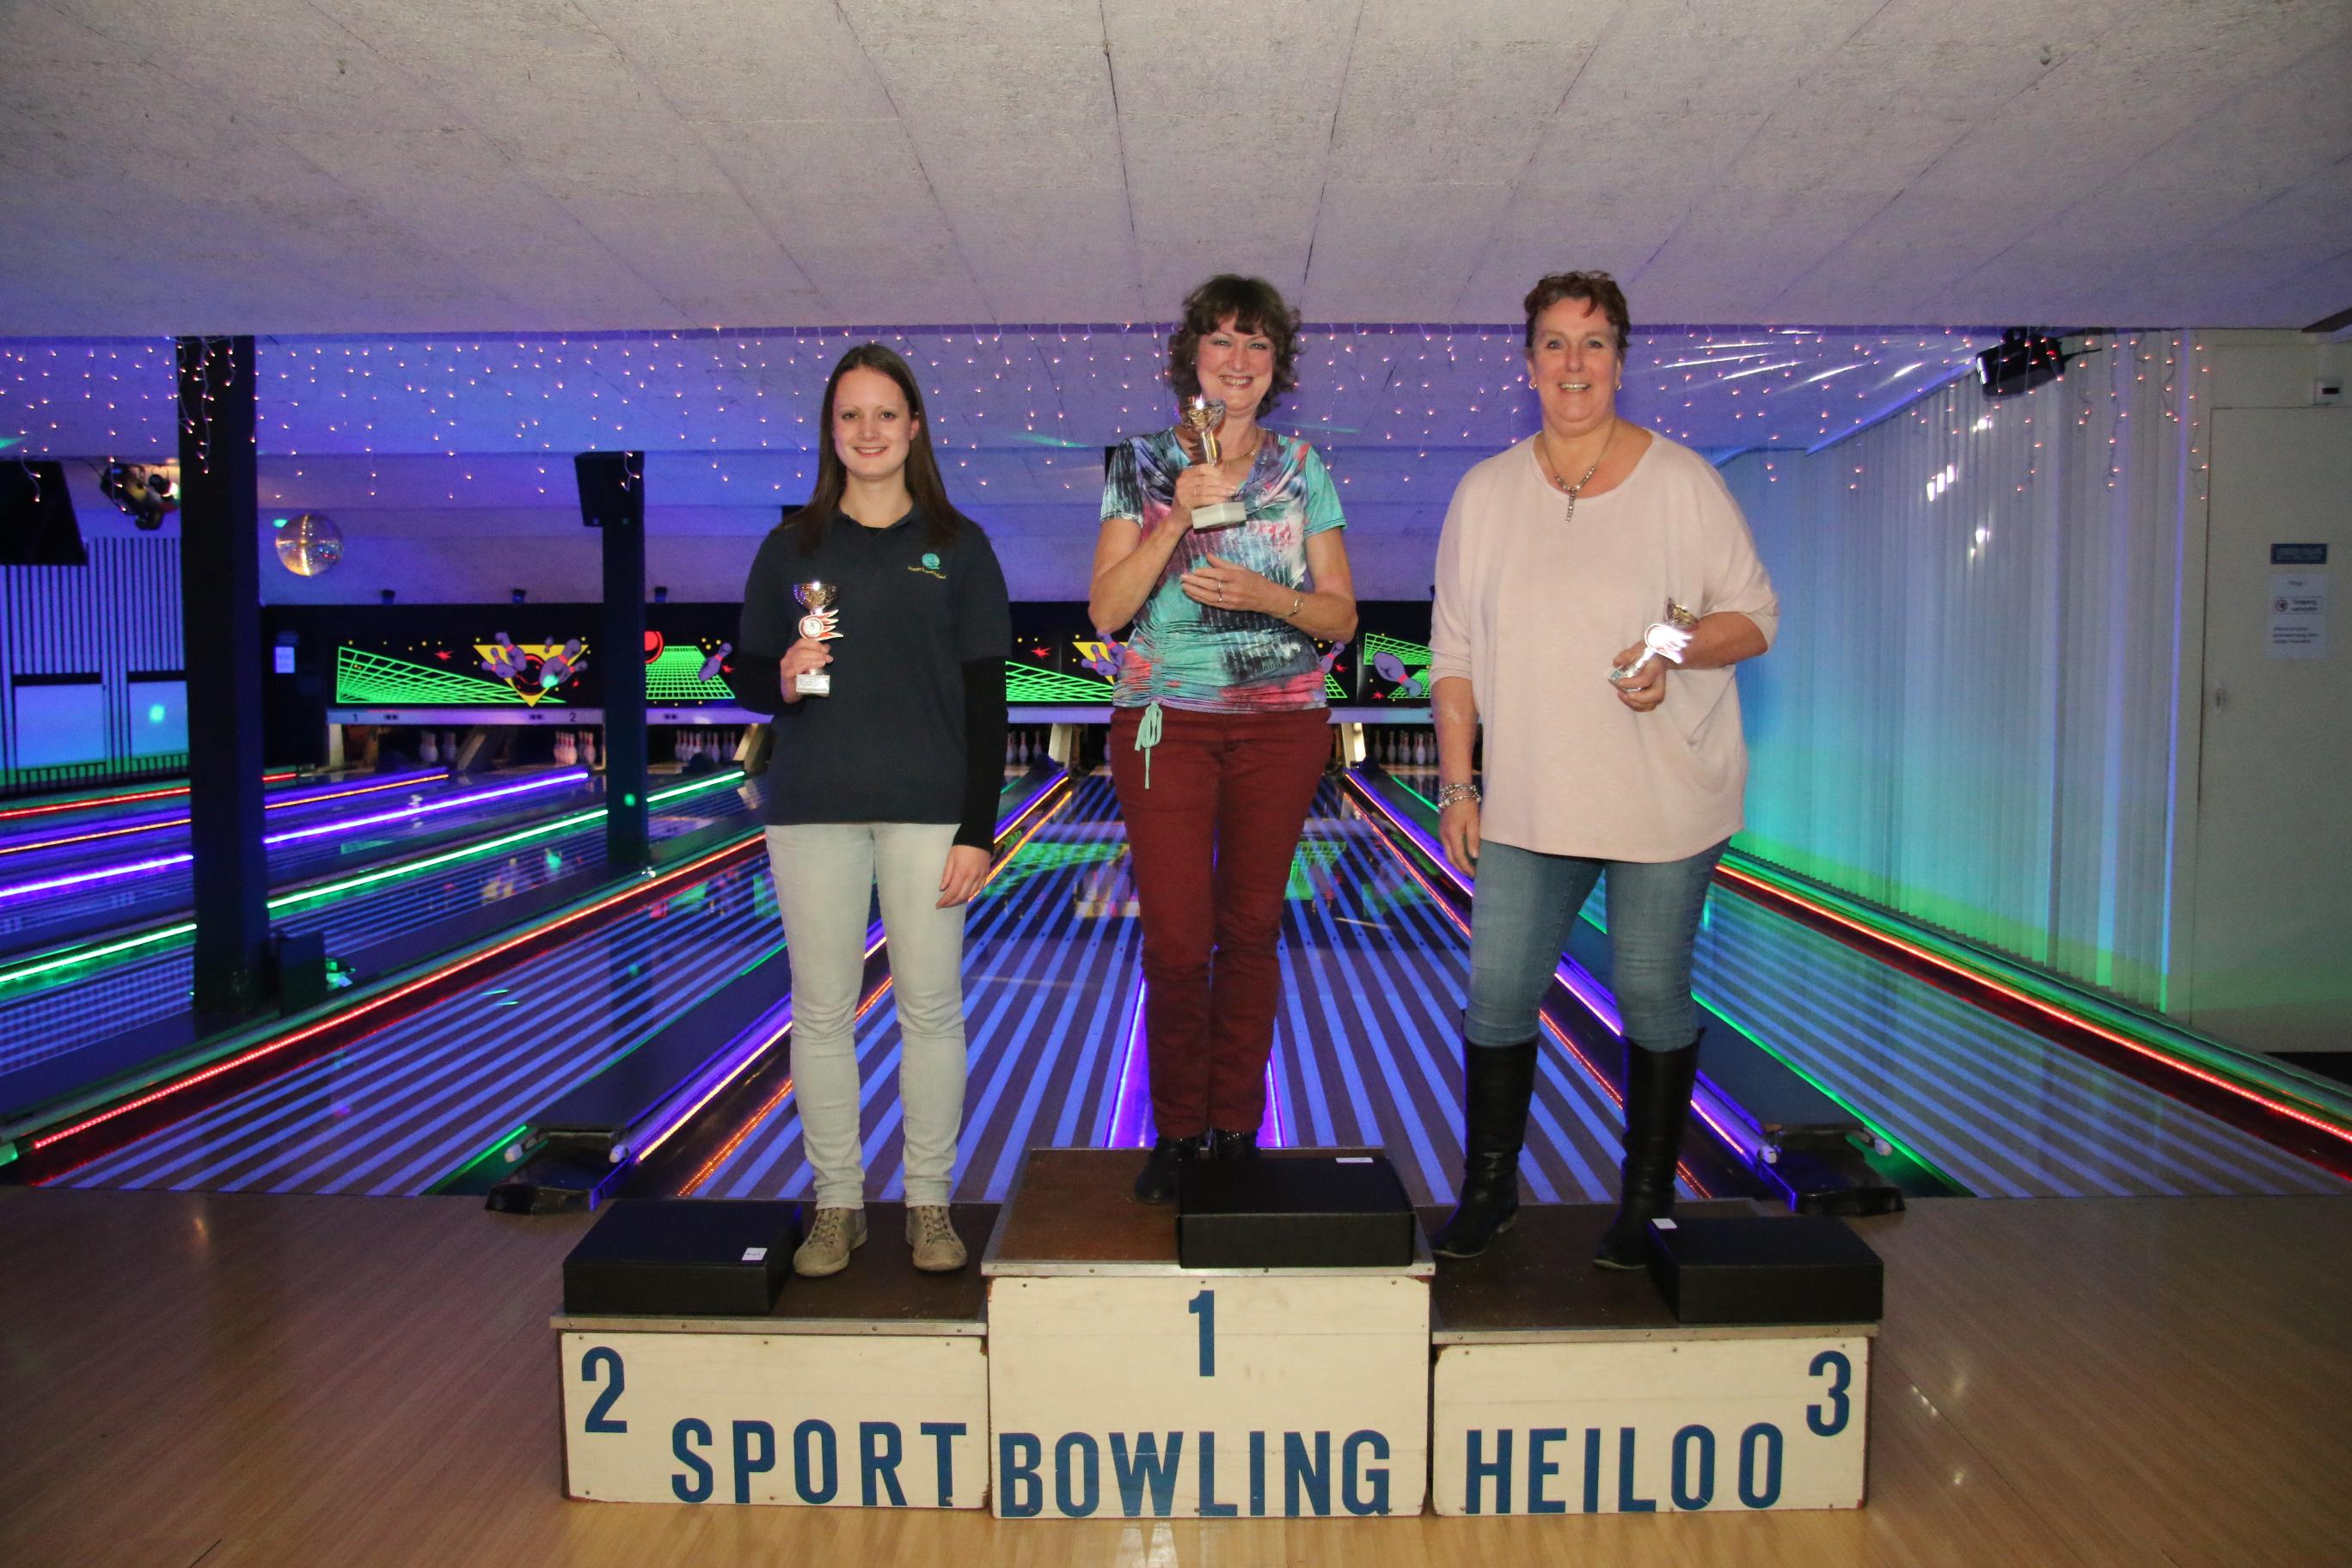 http://www.bowlingverenigingheiloo.nl/fotos_verhalen/foto's/2016_1222-Kerst-Dames-B.jpg